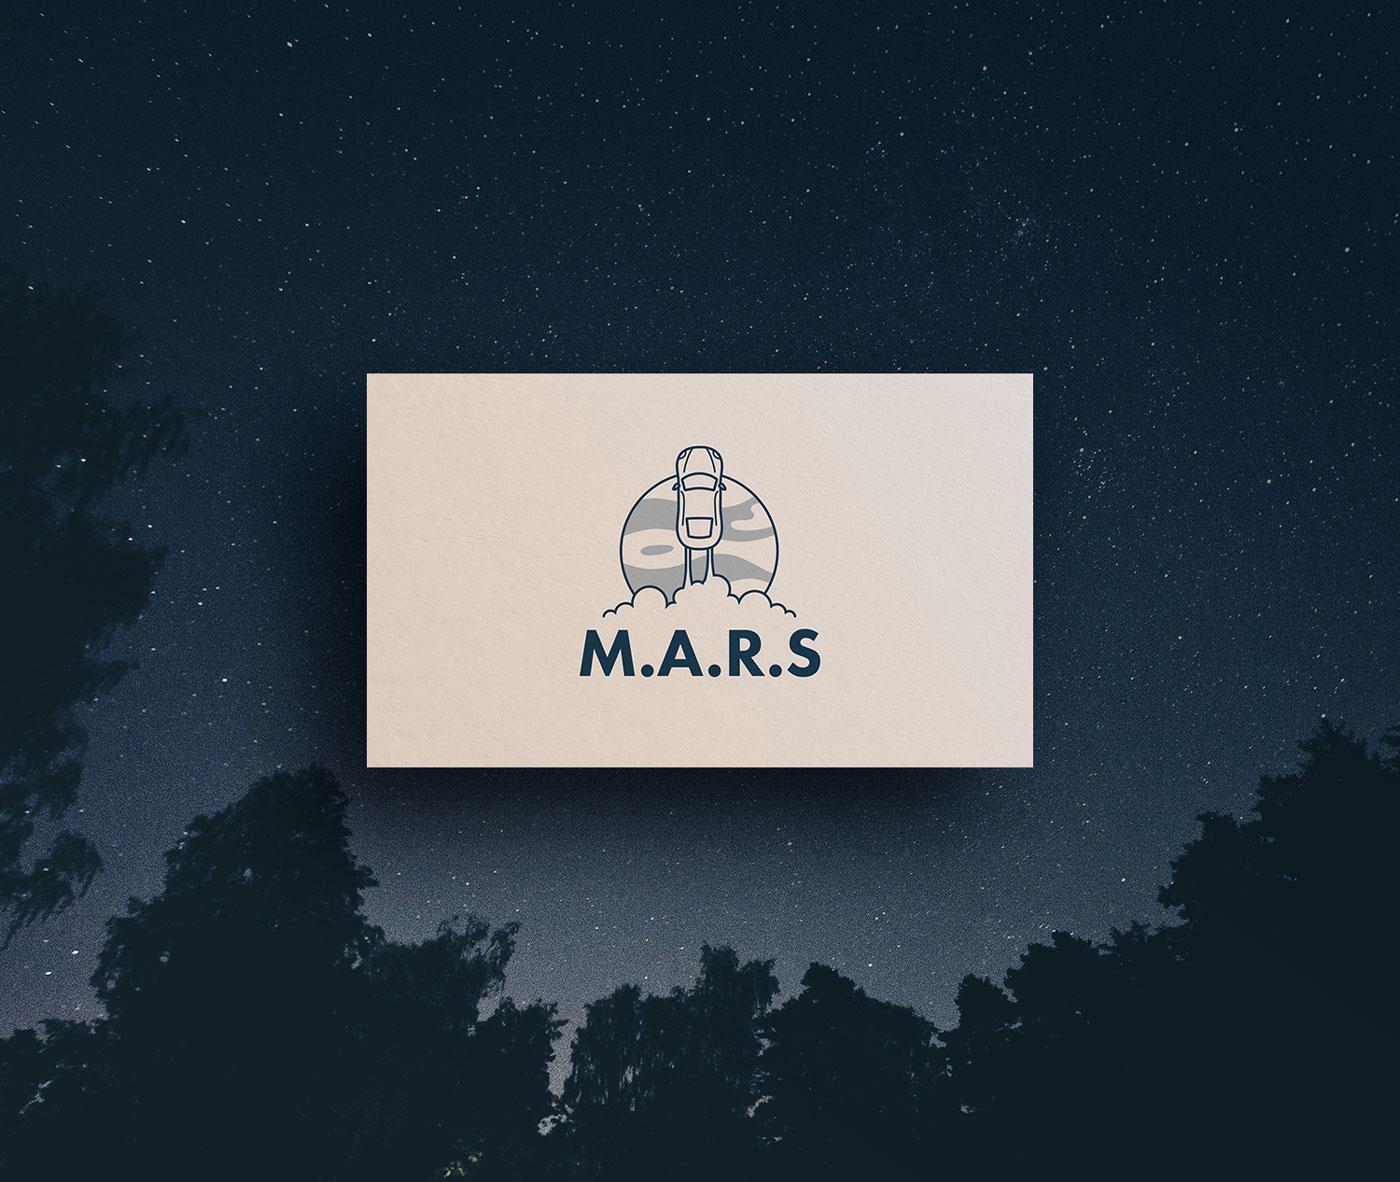 M.A.R.S Business card design.